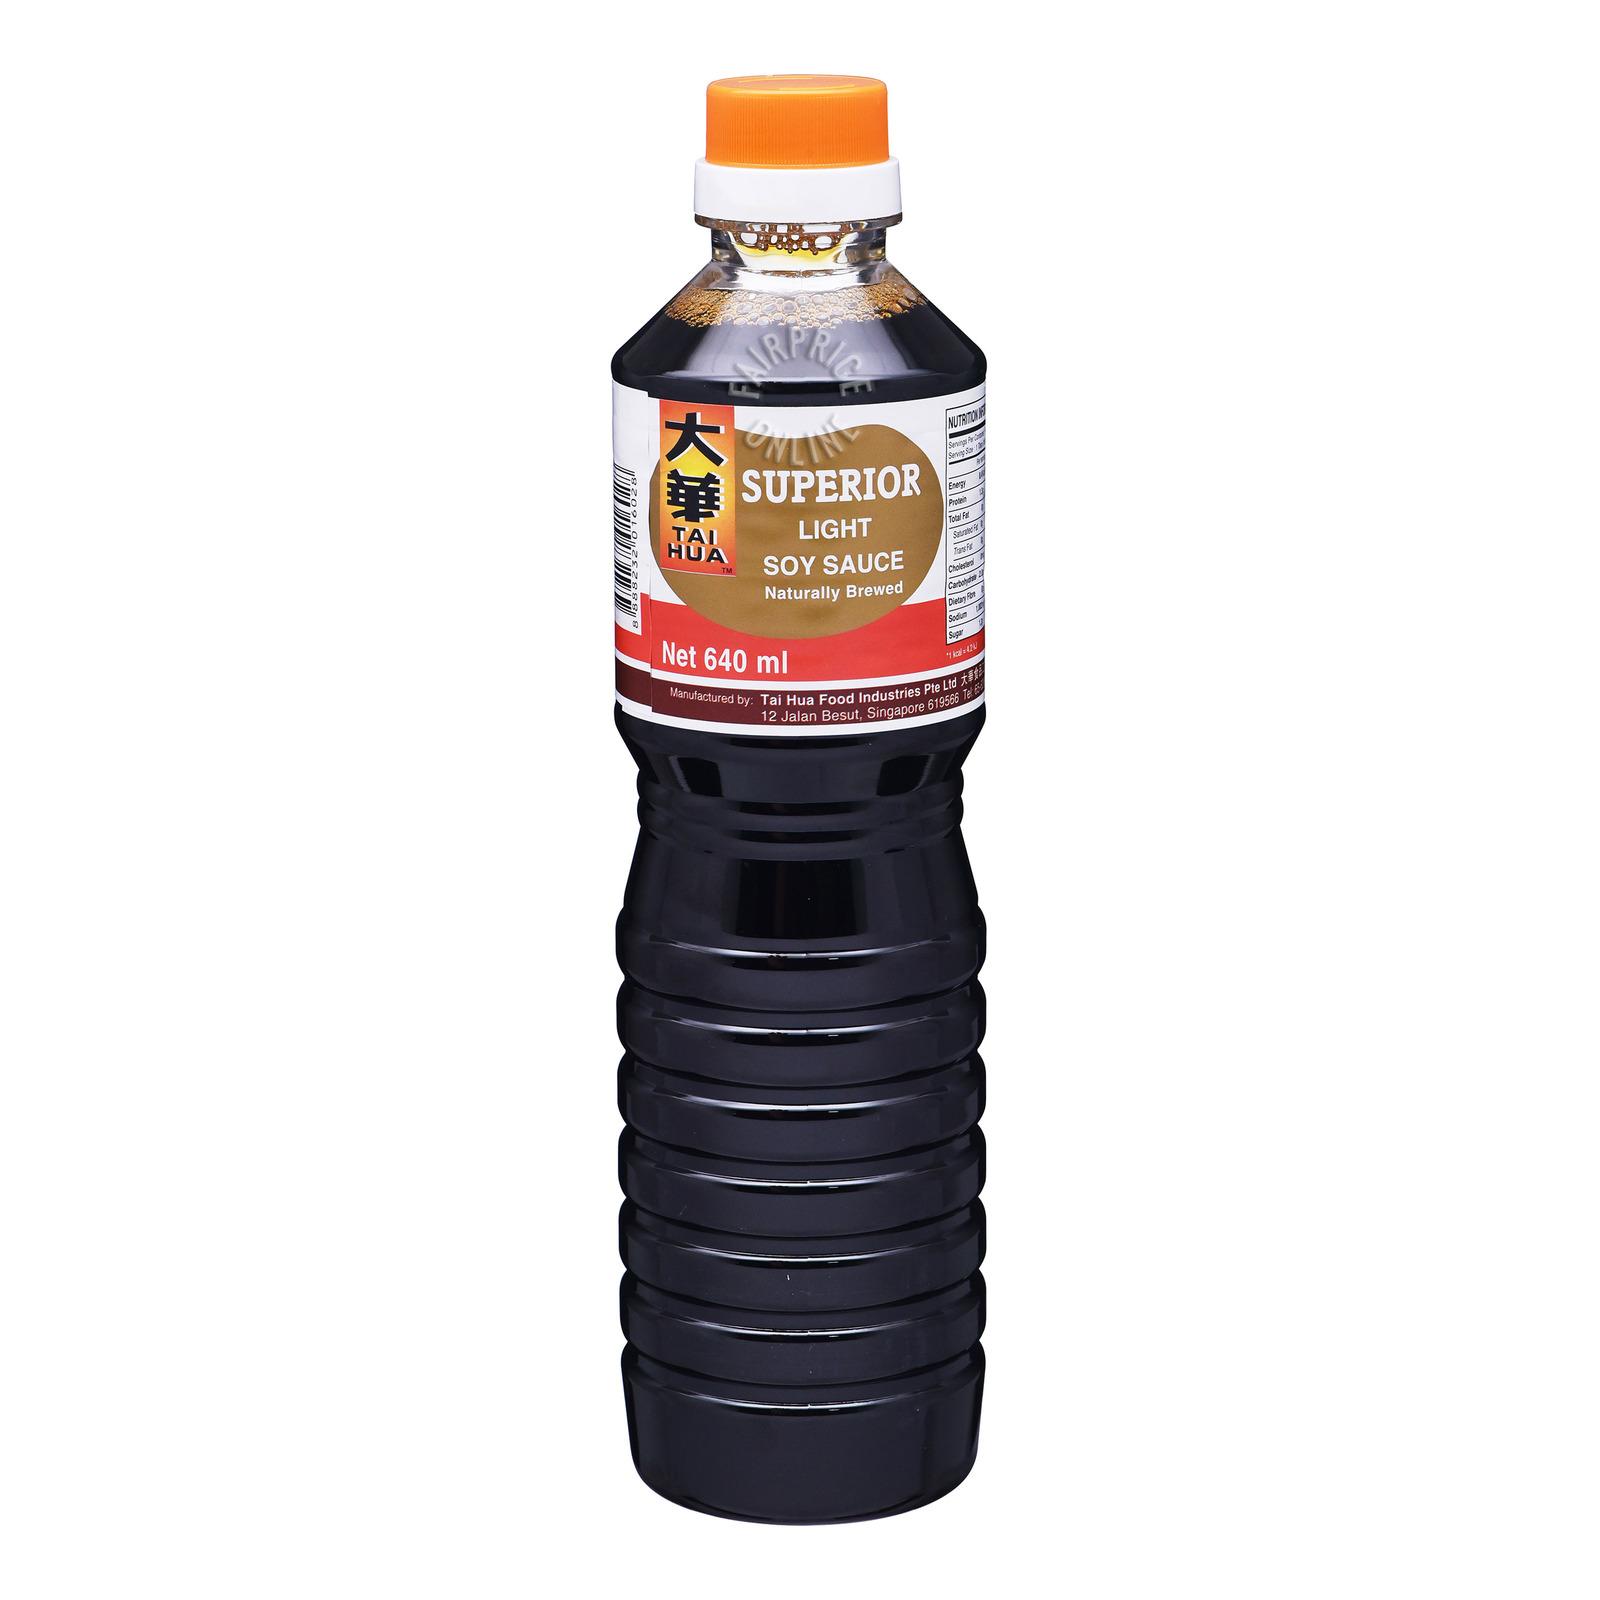 Tai Hua Light Soy Sauce - Superior